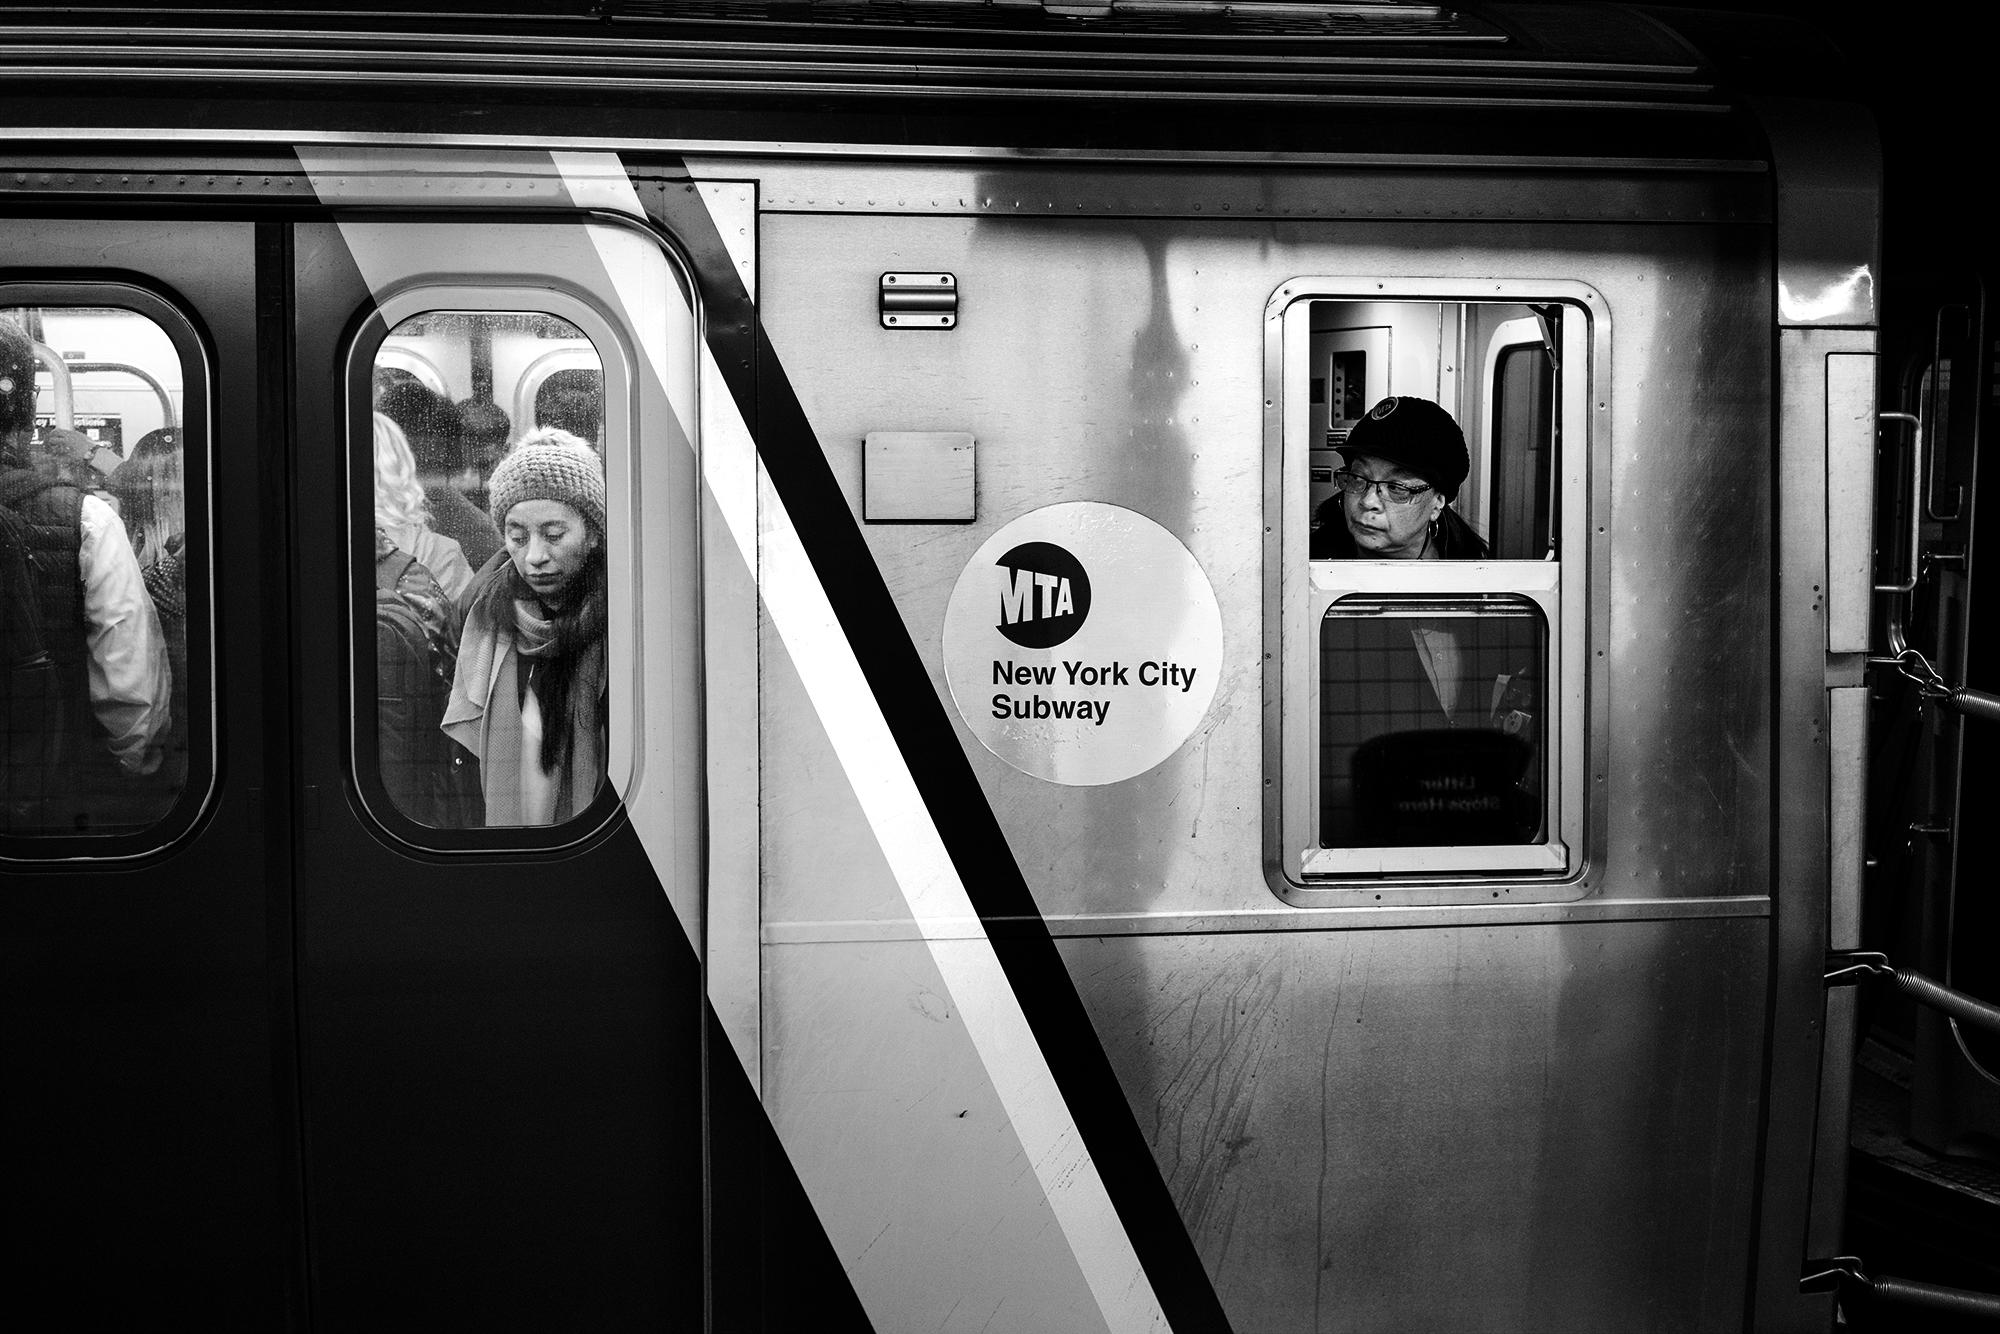 Brklyn_Subway_2017_Trapped_Straphanger-014.jpg